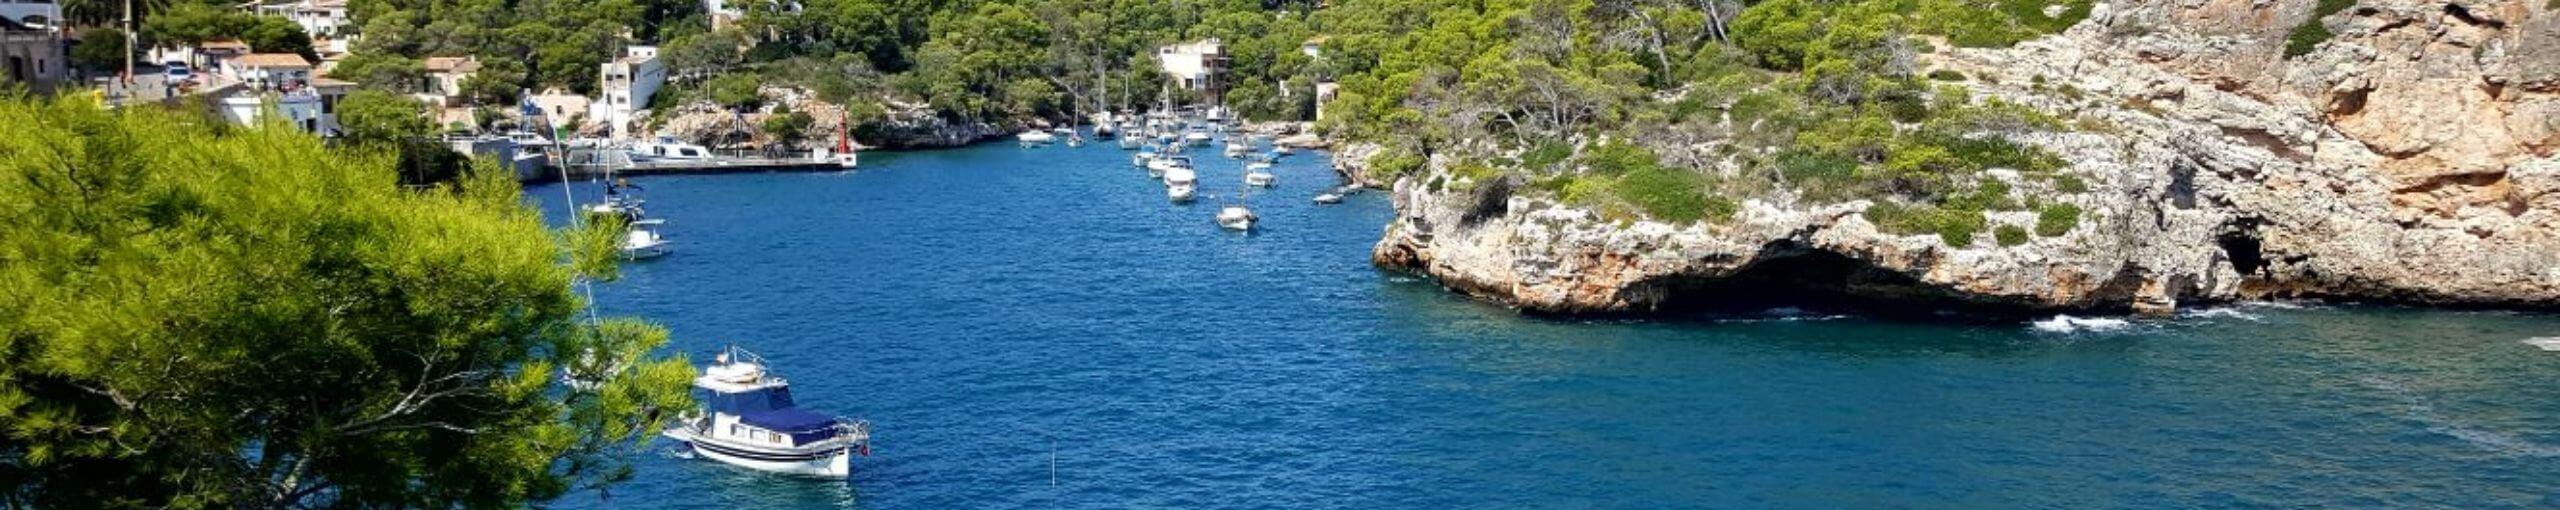 Viajar a Islas Baleares